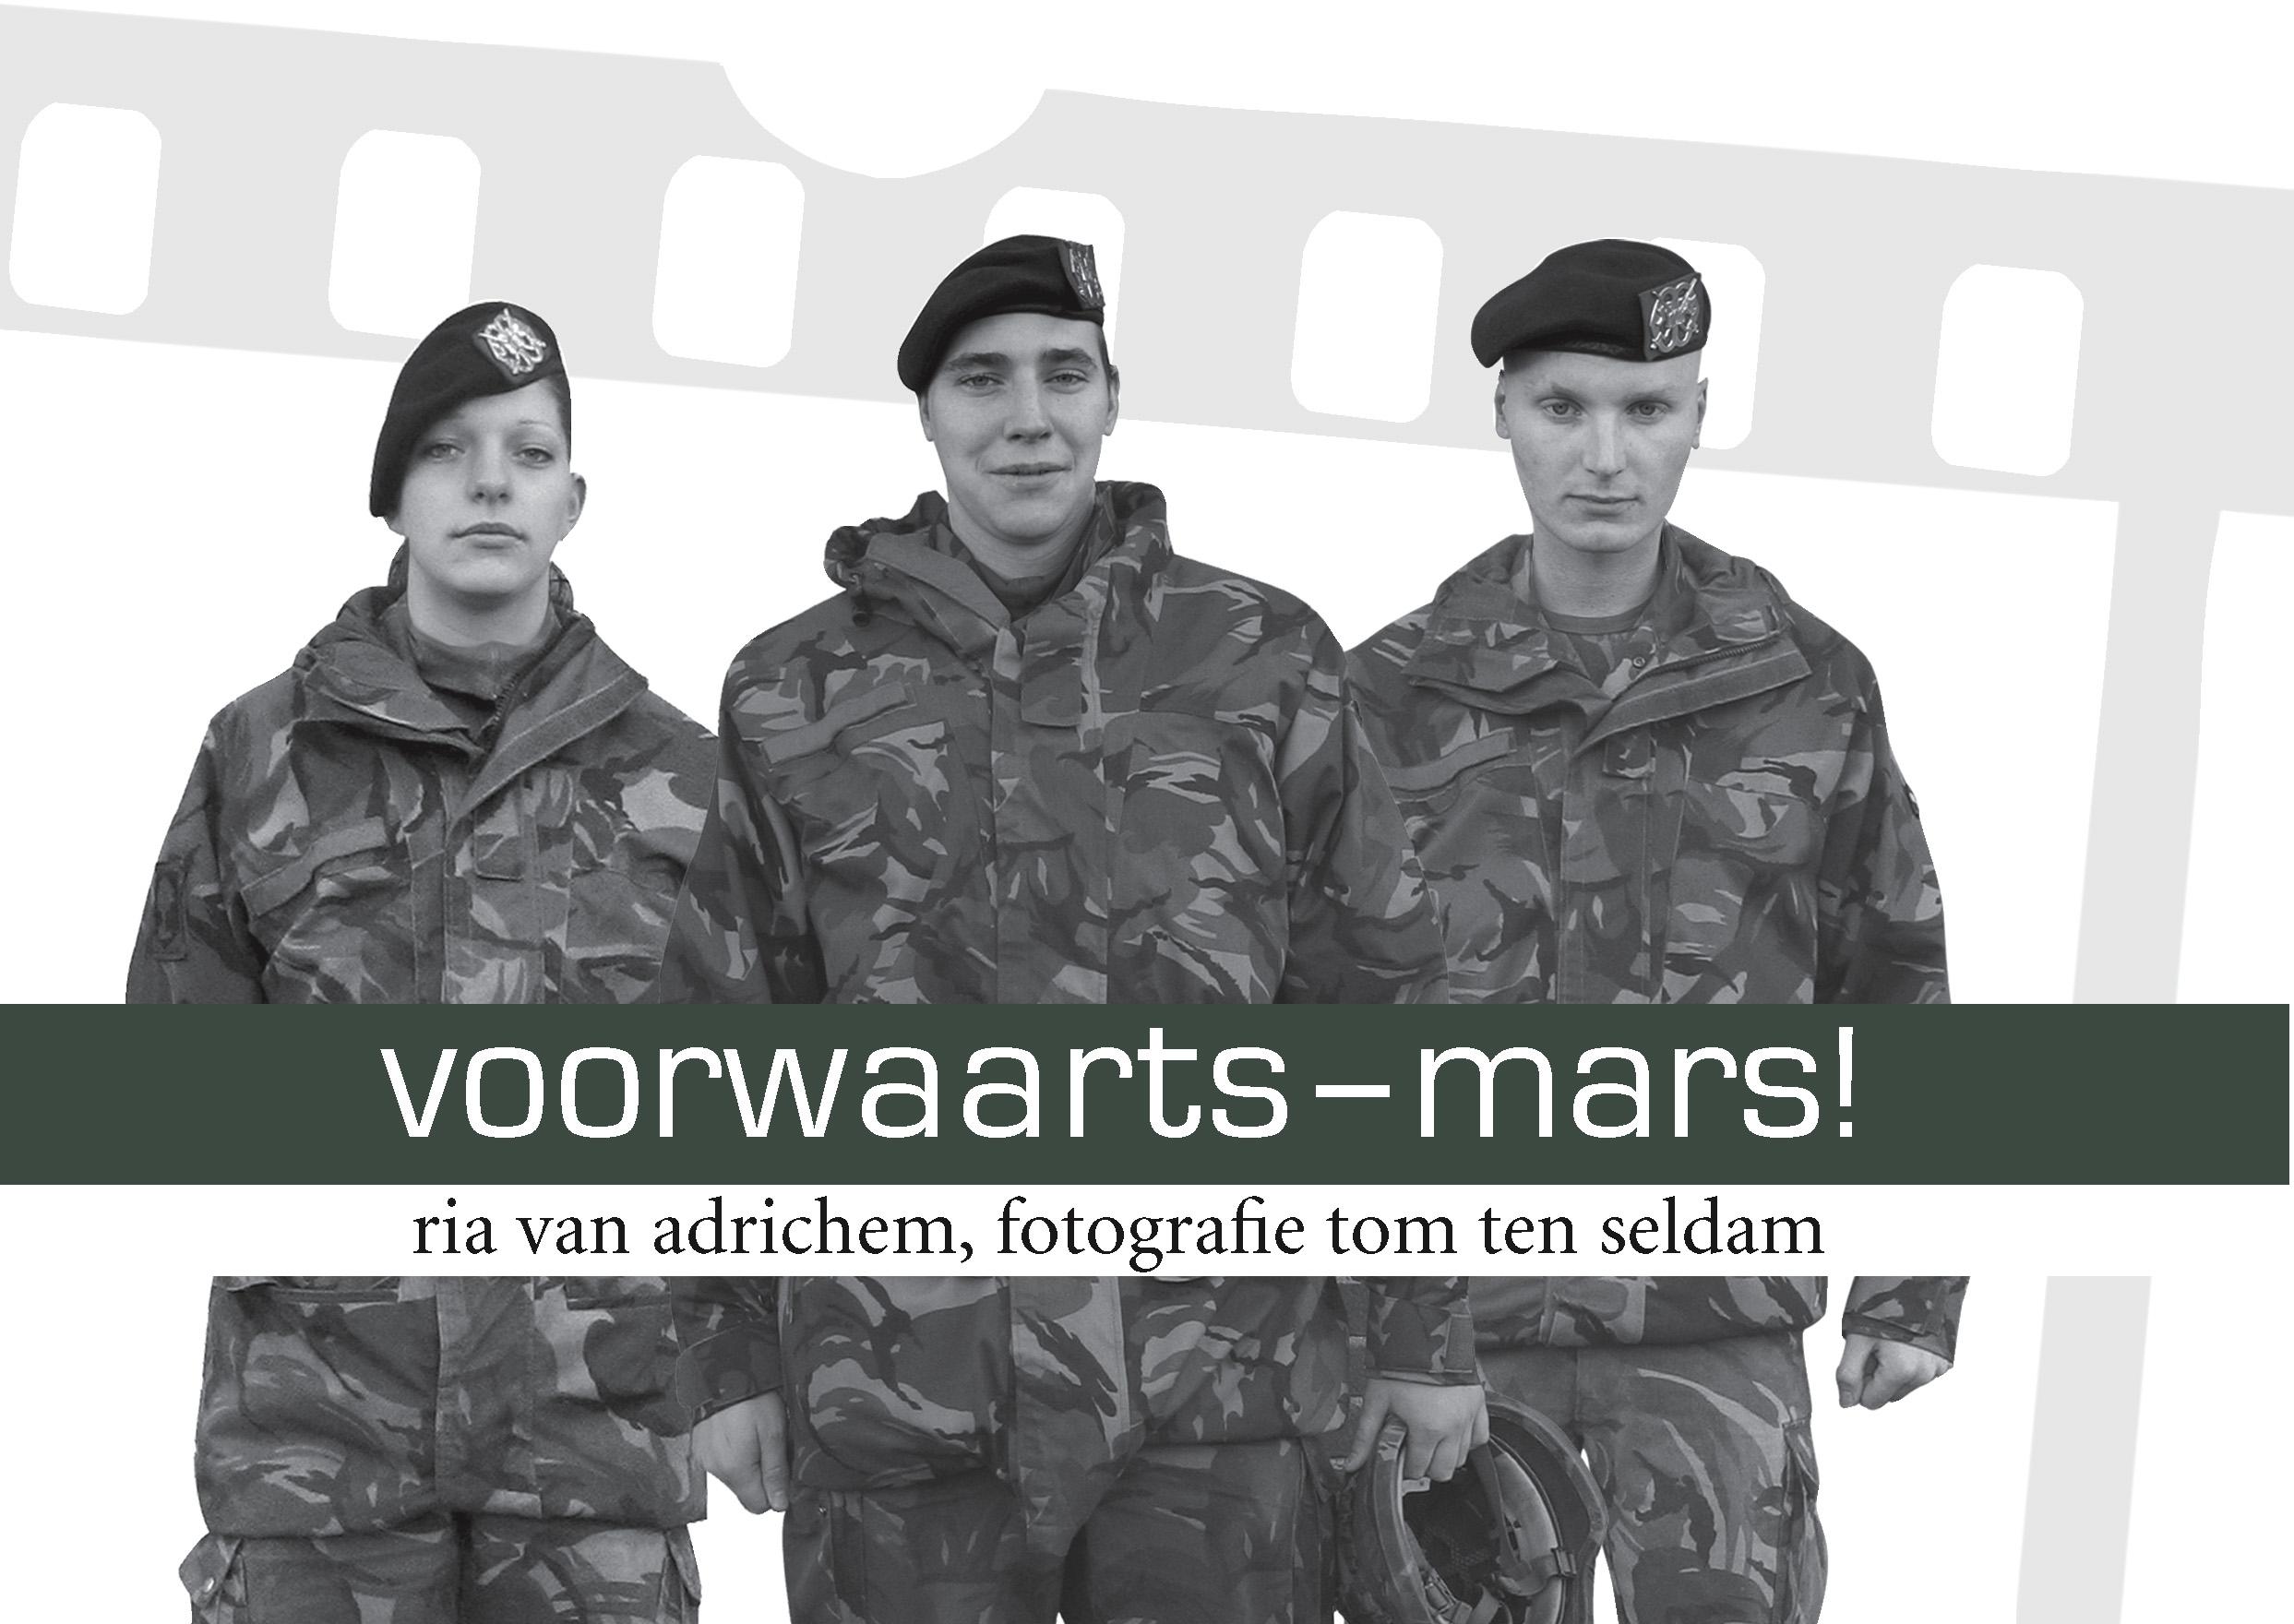 Voorwaarts-mars!